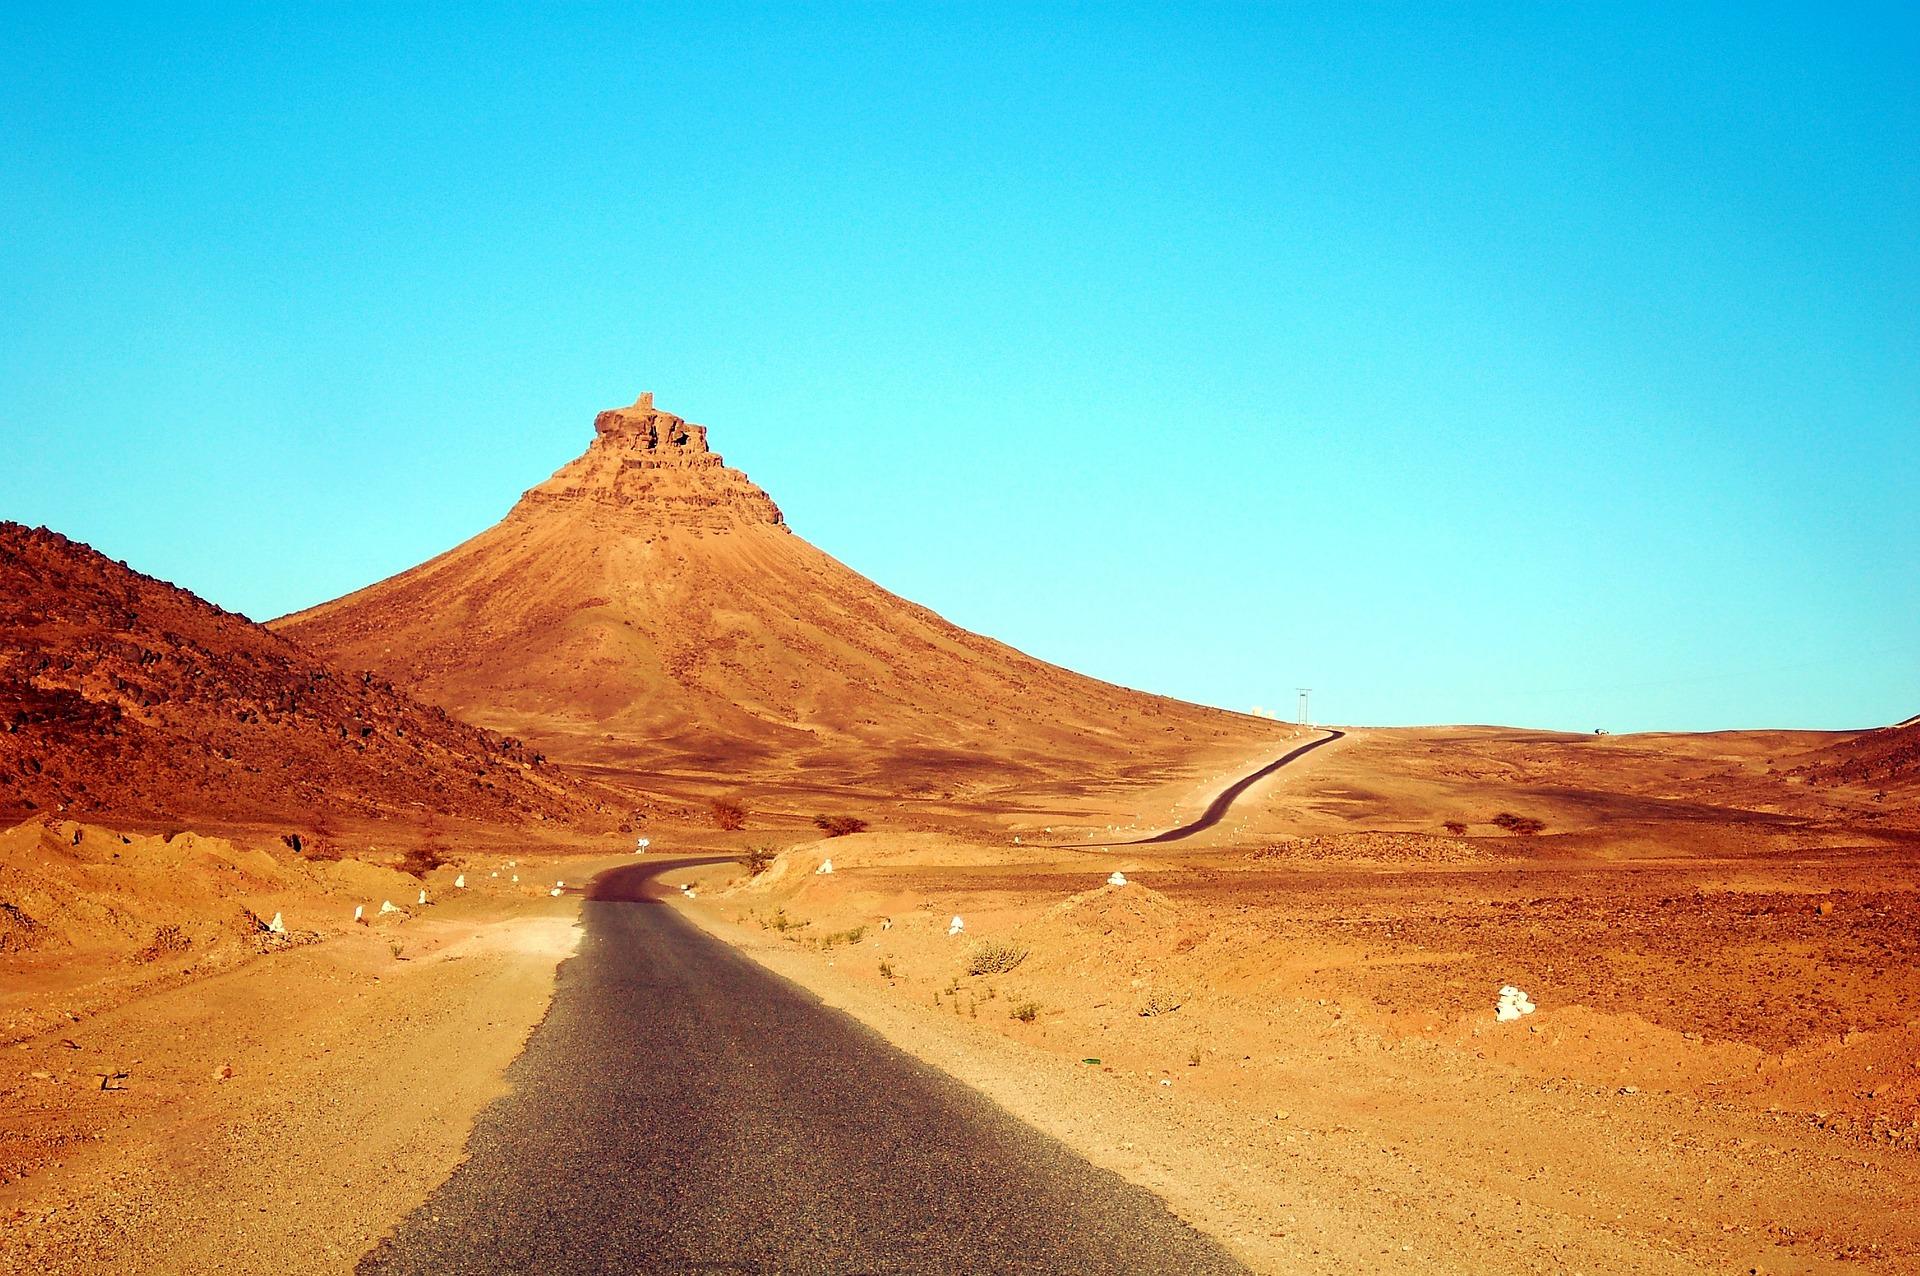 morocco-123981_1920